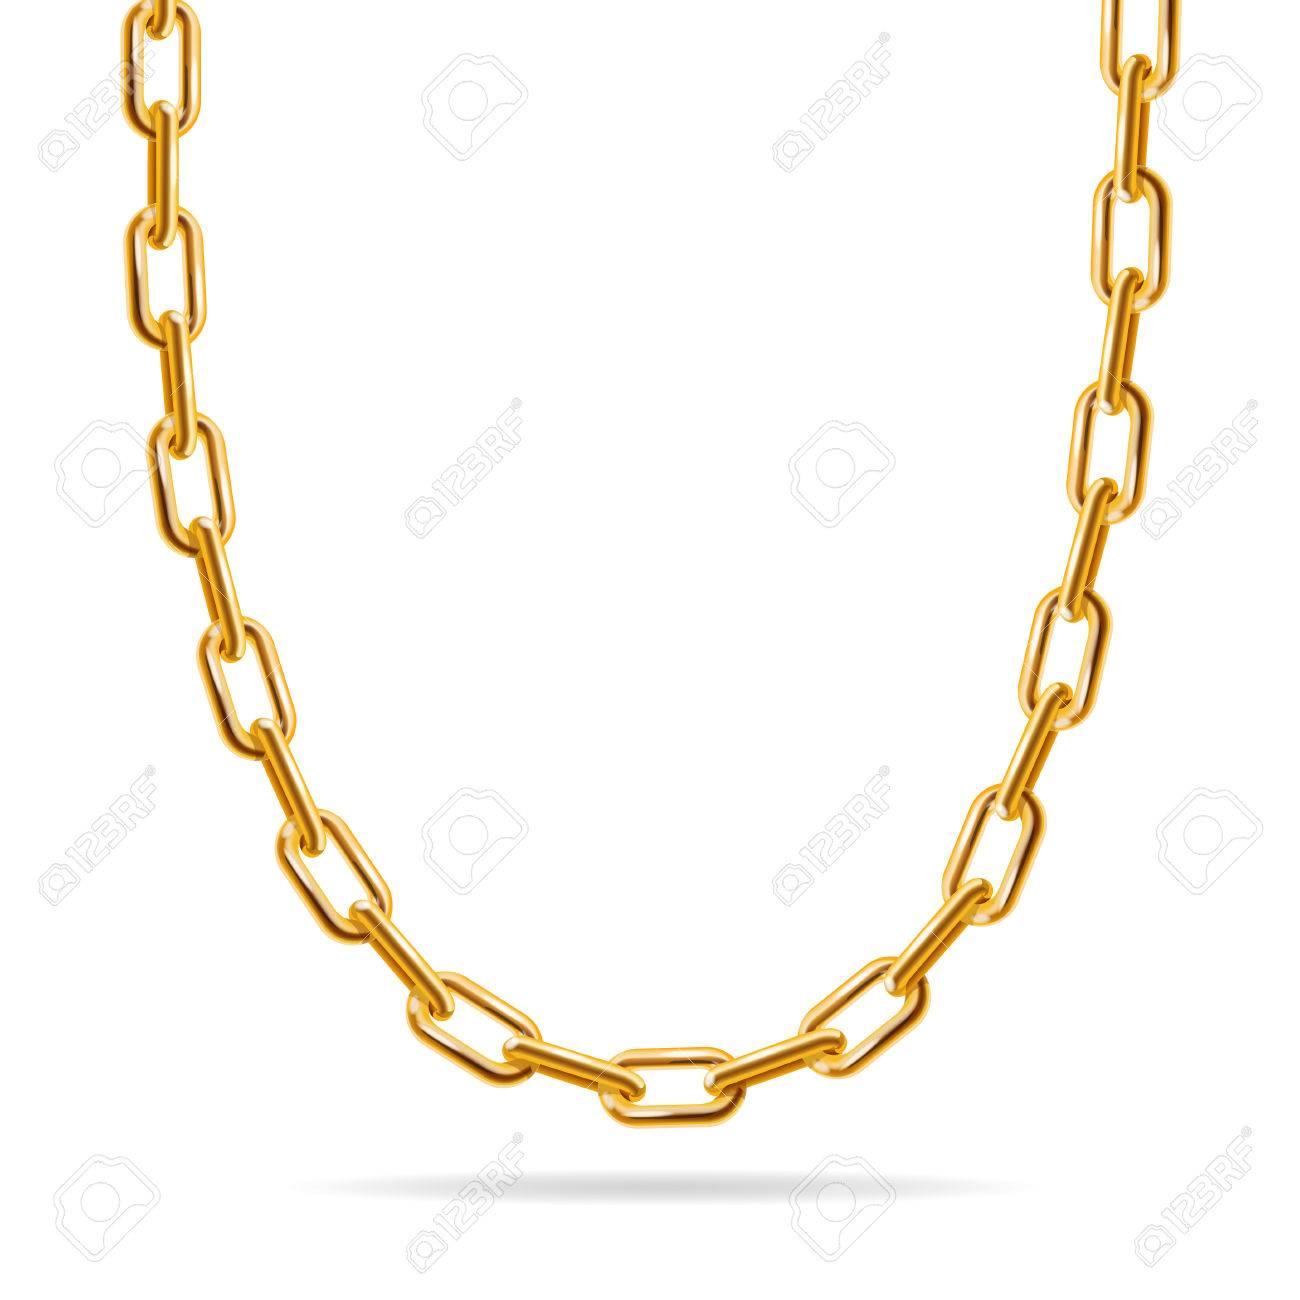 Gold Chain. Fashion Design for Jewelry. Vector illustration - 50438584